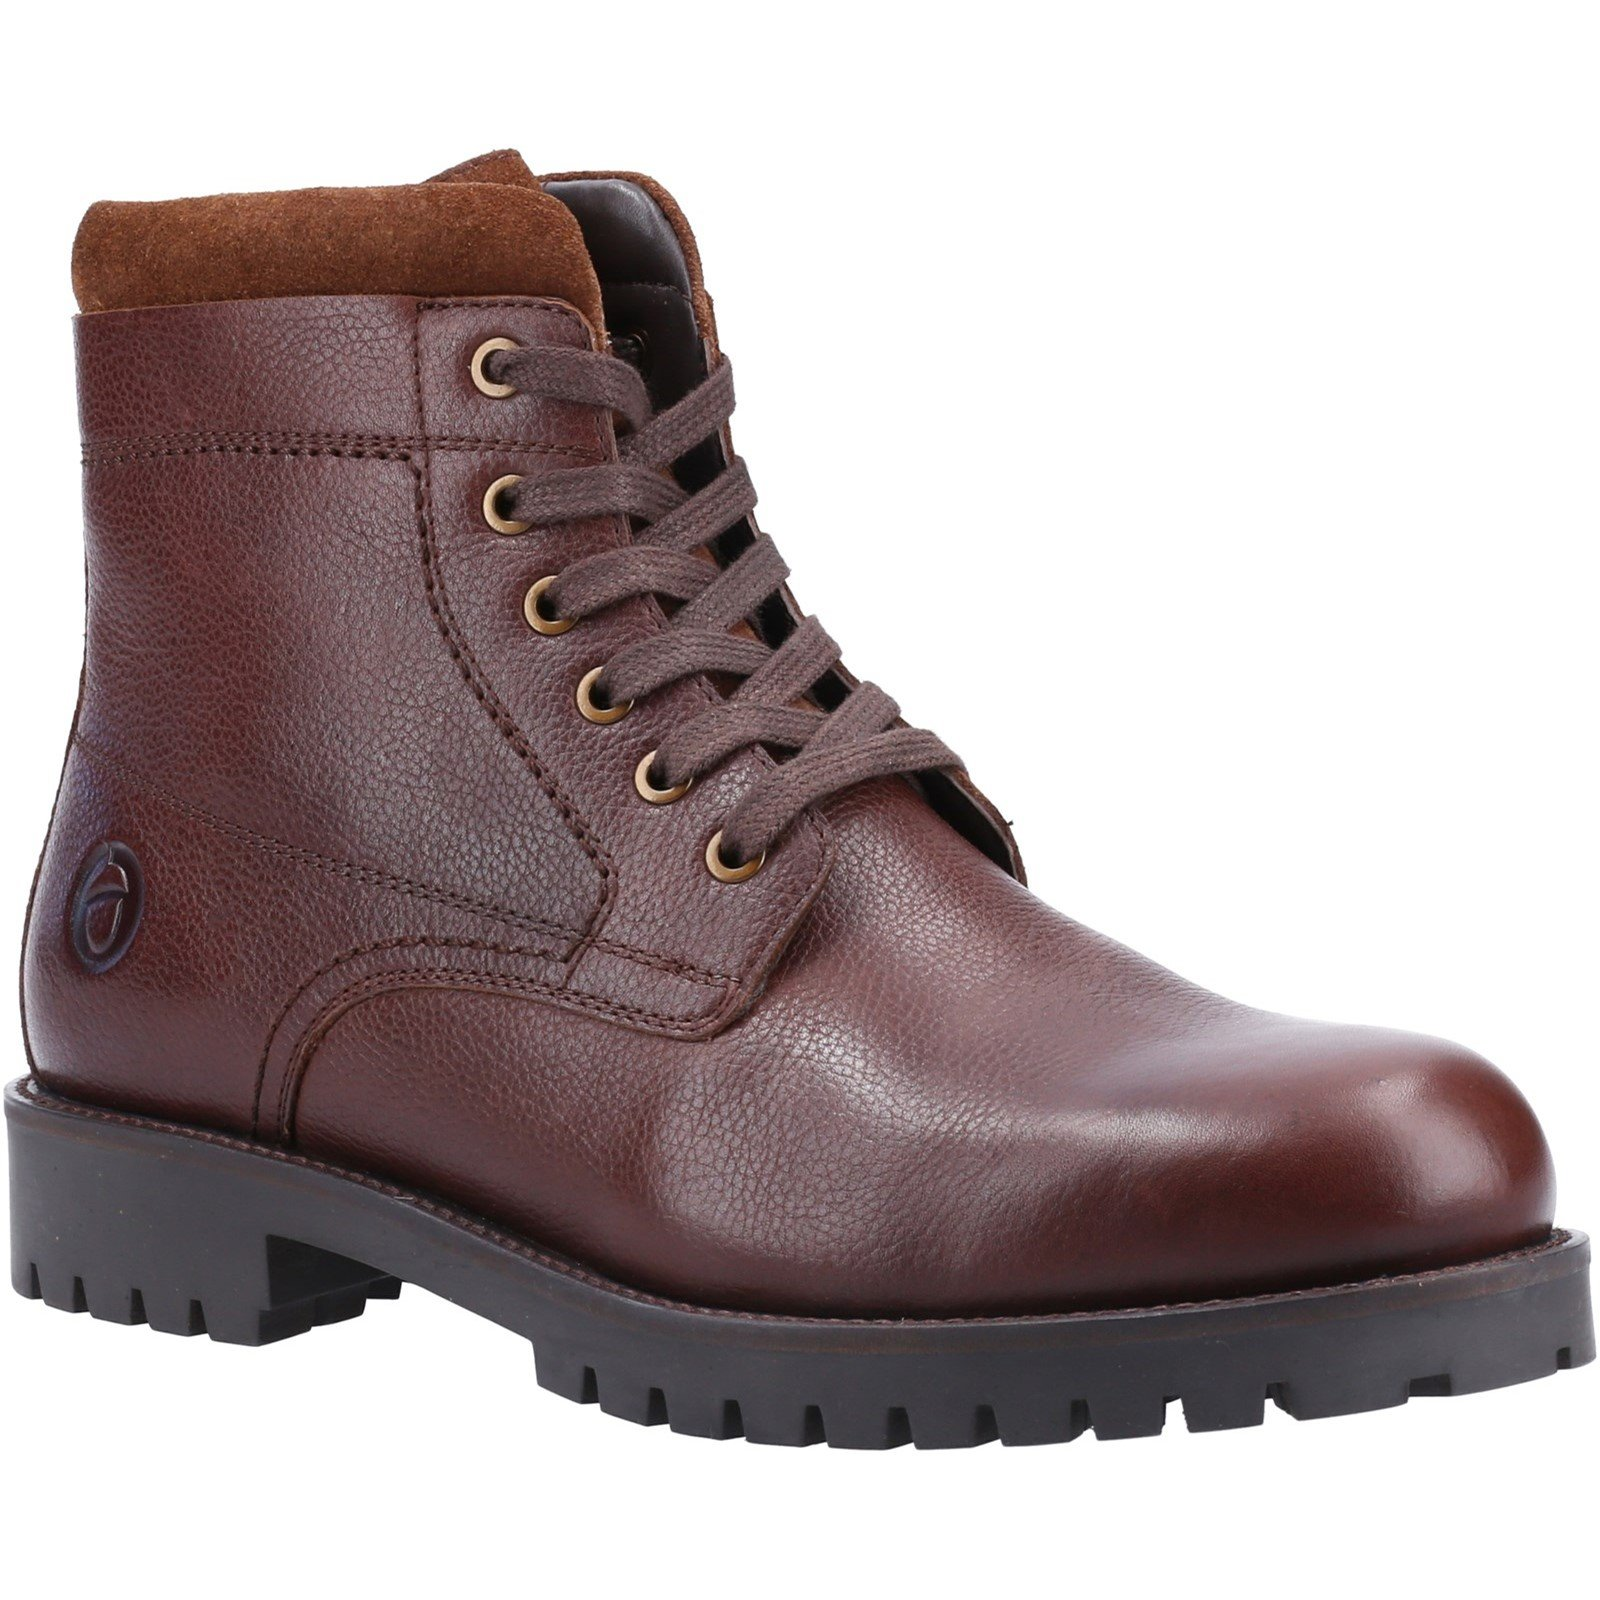 Cotswold Men's Thorsbury Lace Up Shoe Boot Various Colours 32963 - Brown 11